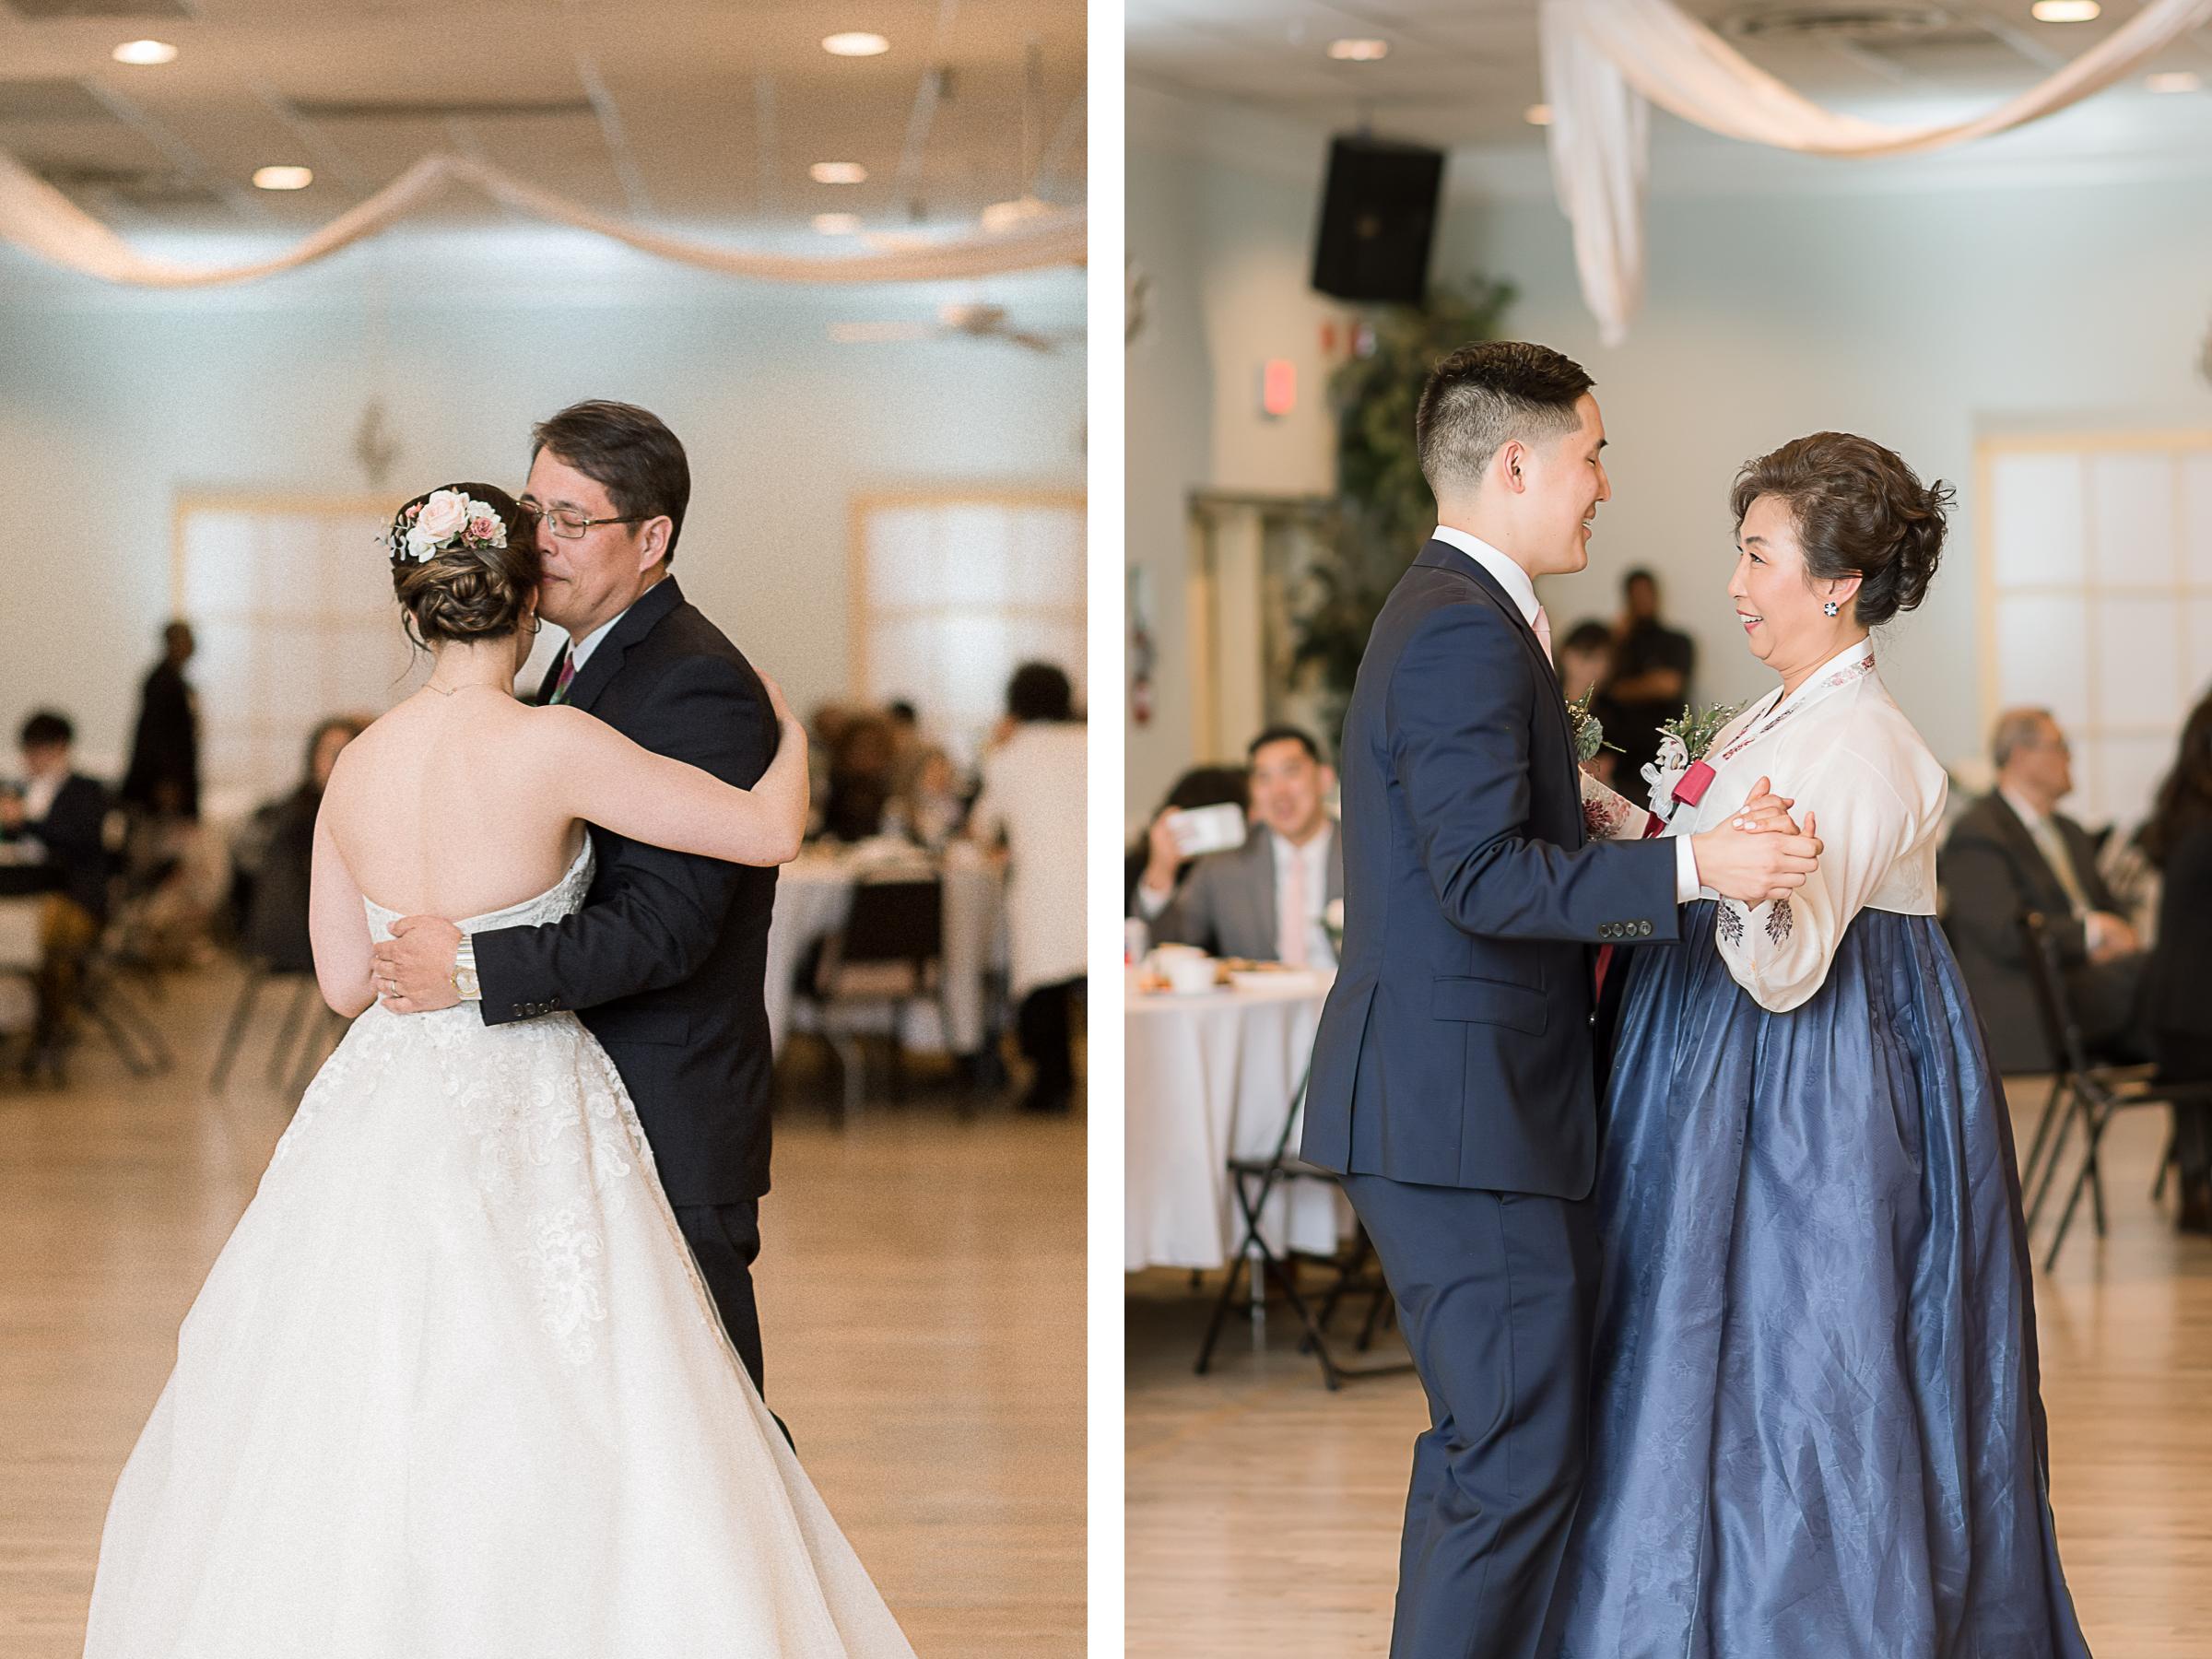 MD-Wedding-Columbia-Inn-Hollywood-Ballroom-Bridal-Party-64.jpg